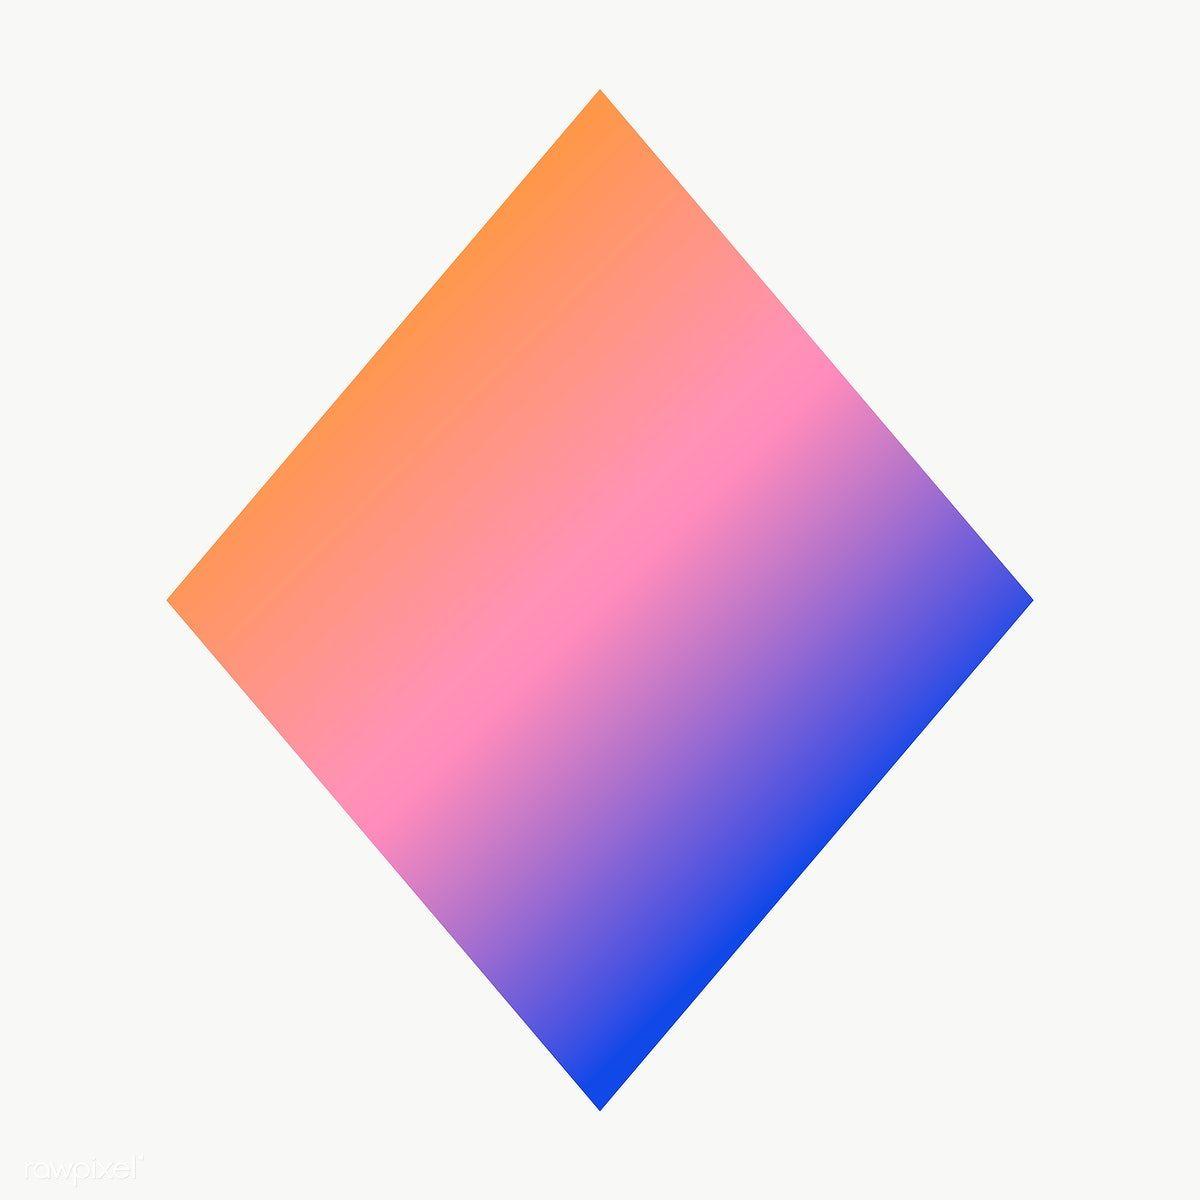 Gradient Rhombus Geometric Shape Transparent Png Free Image By Rawpixel Com Ningzk V Geometric Shapes Printable Designs Geometric